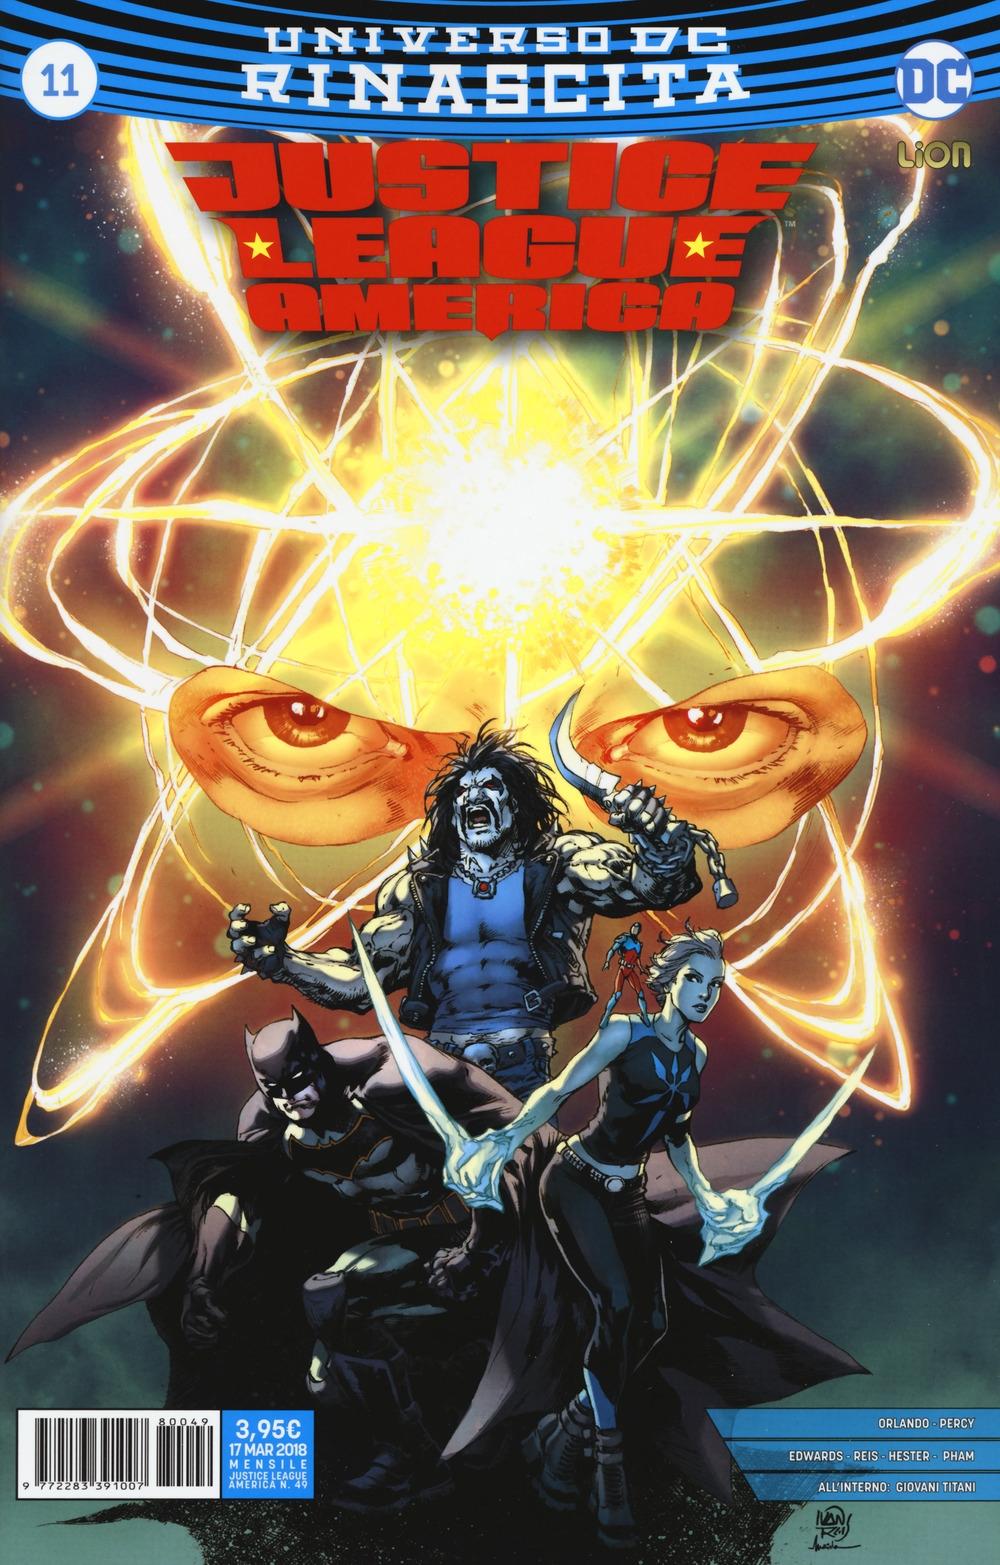 Rinascita. Justice League America. Vol. 11